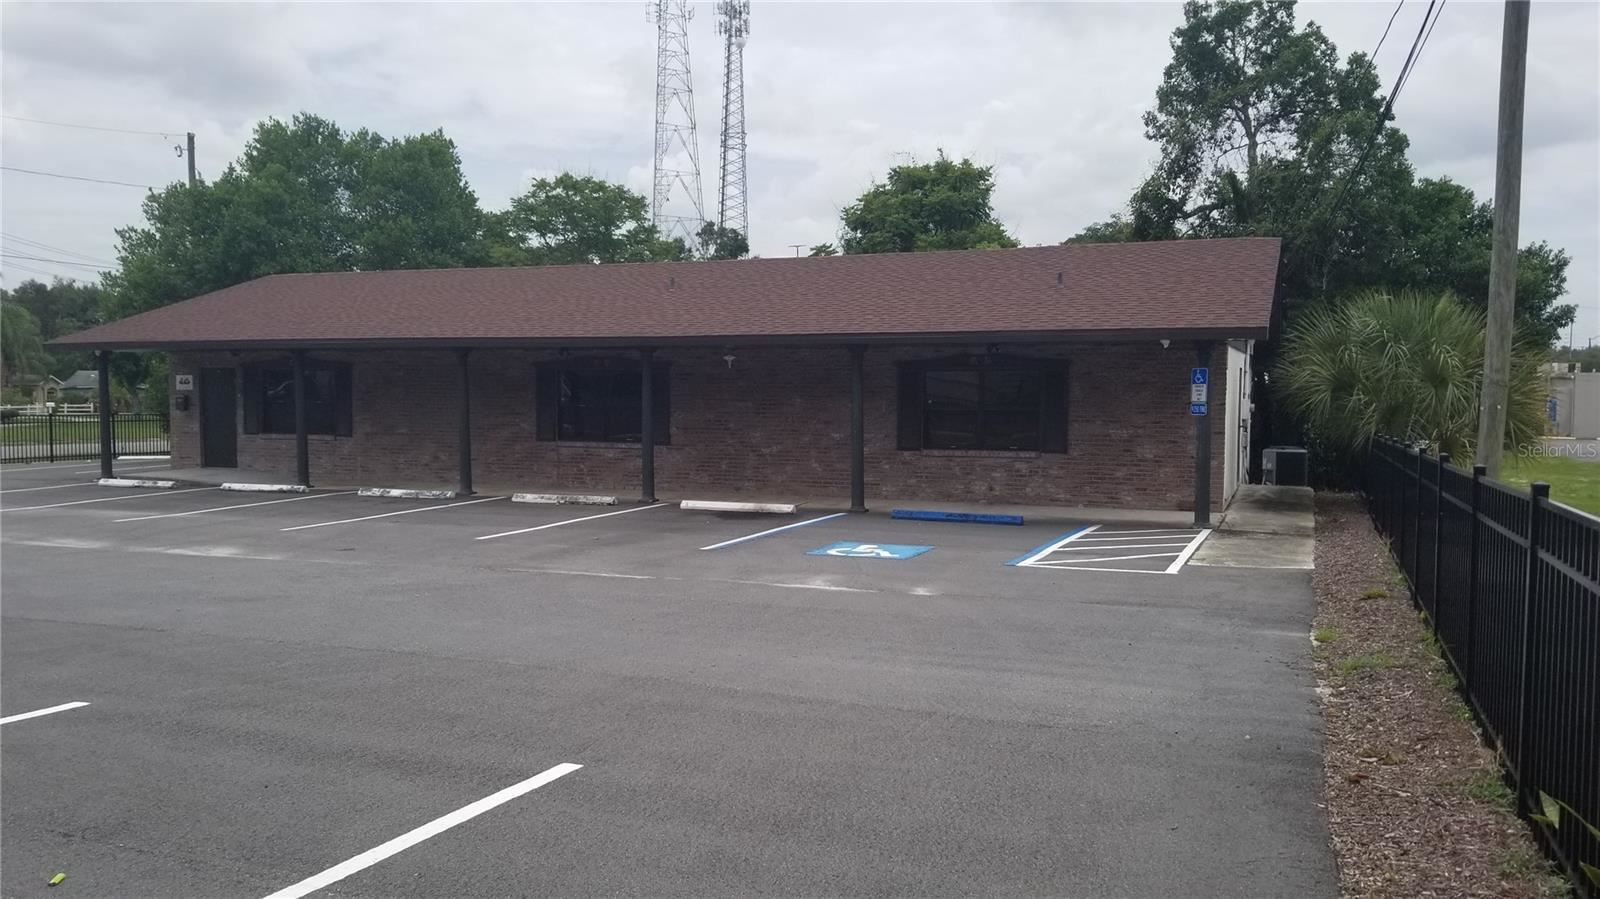 1011 E MAIN STREET, Haines City, FL 33844 - #: P4916263